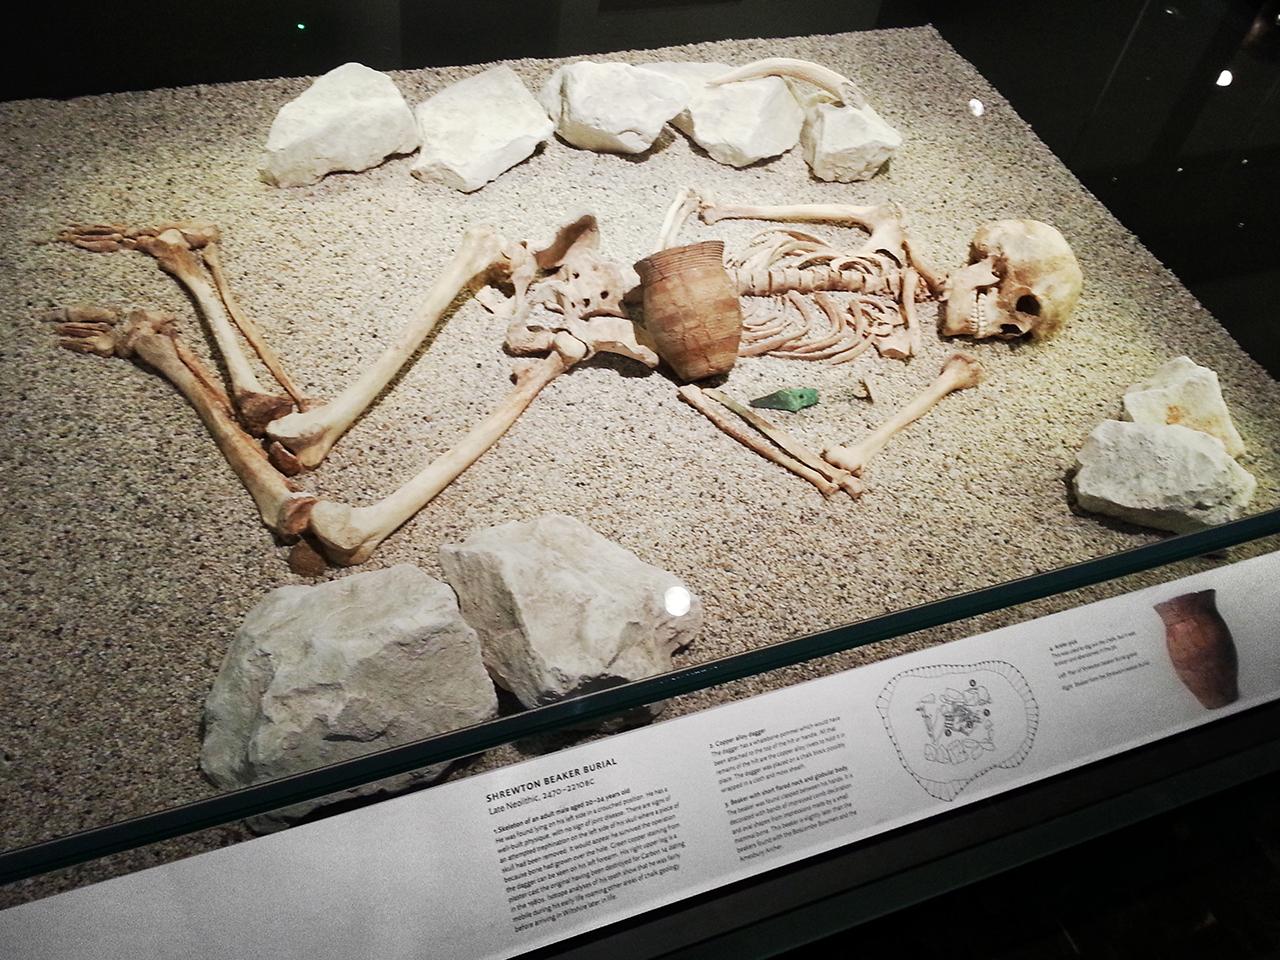 Skeleton exhibit